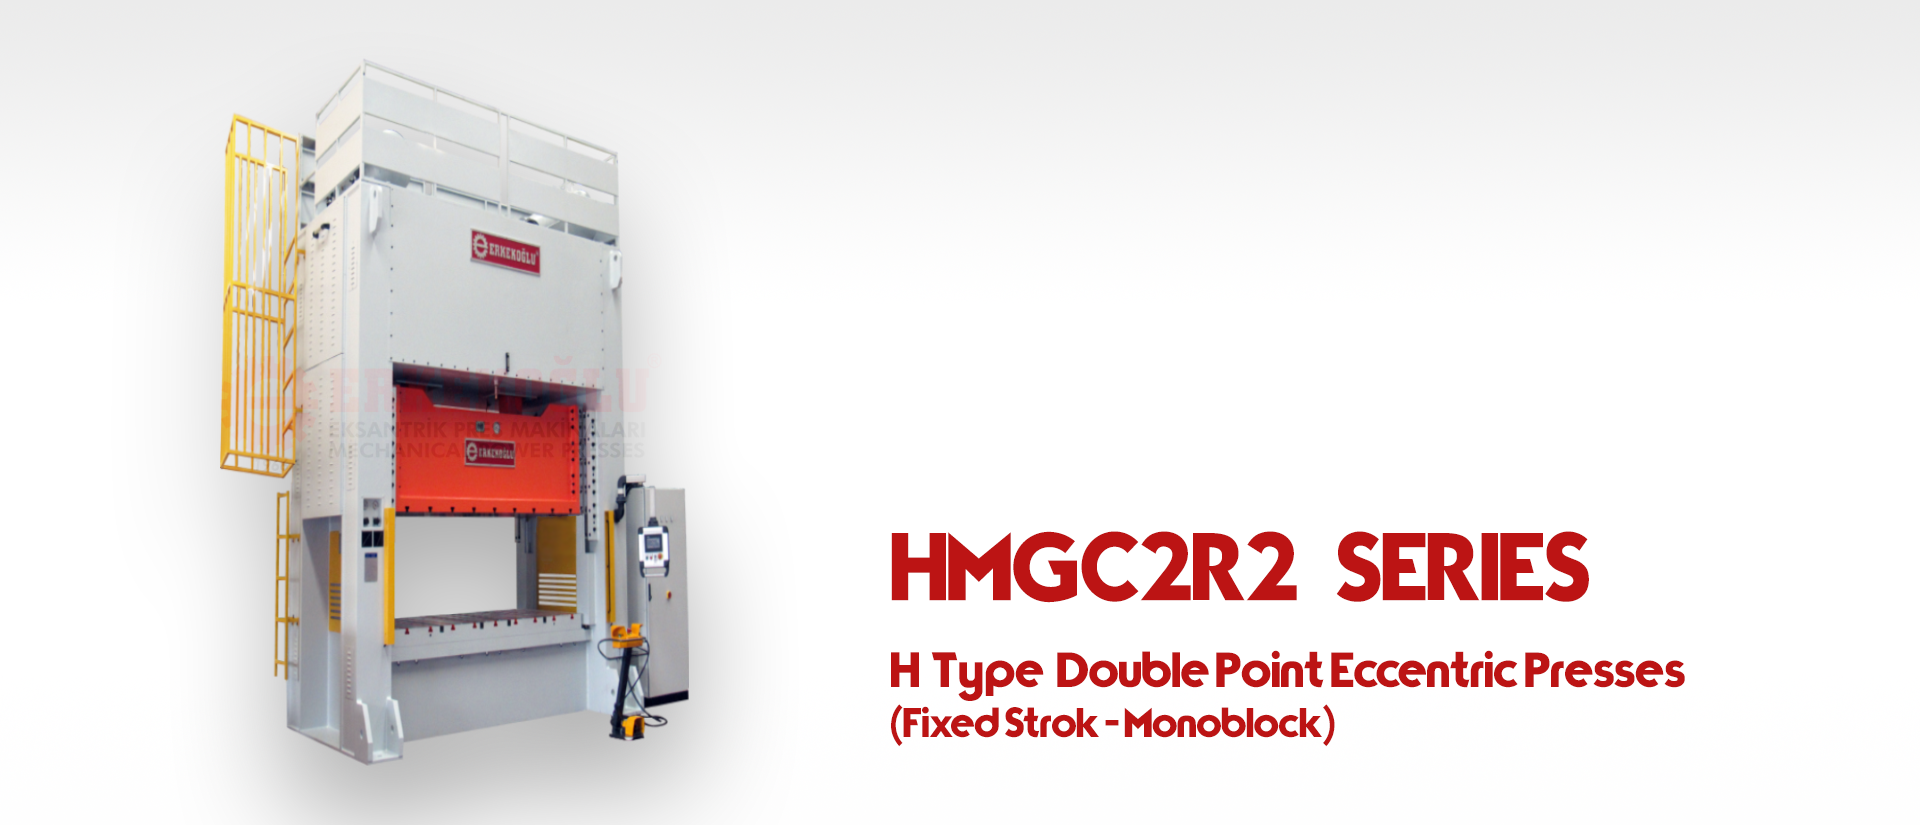 hmgc2r2-baslik-en